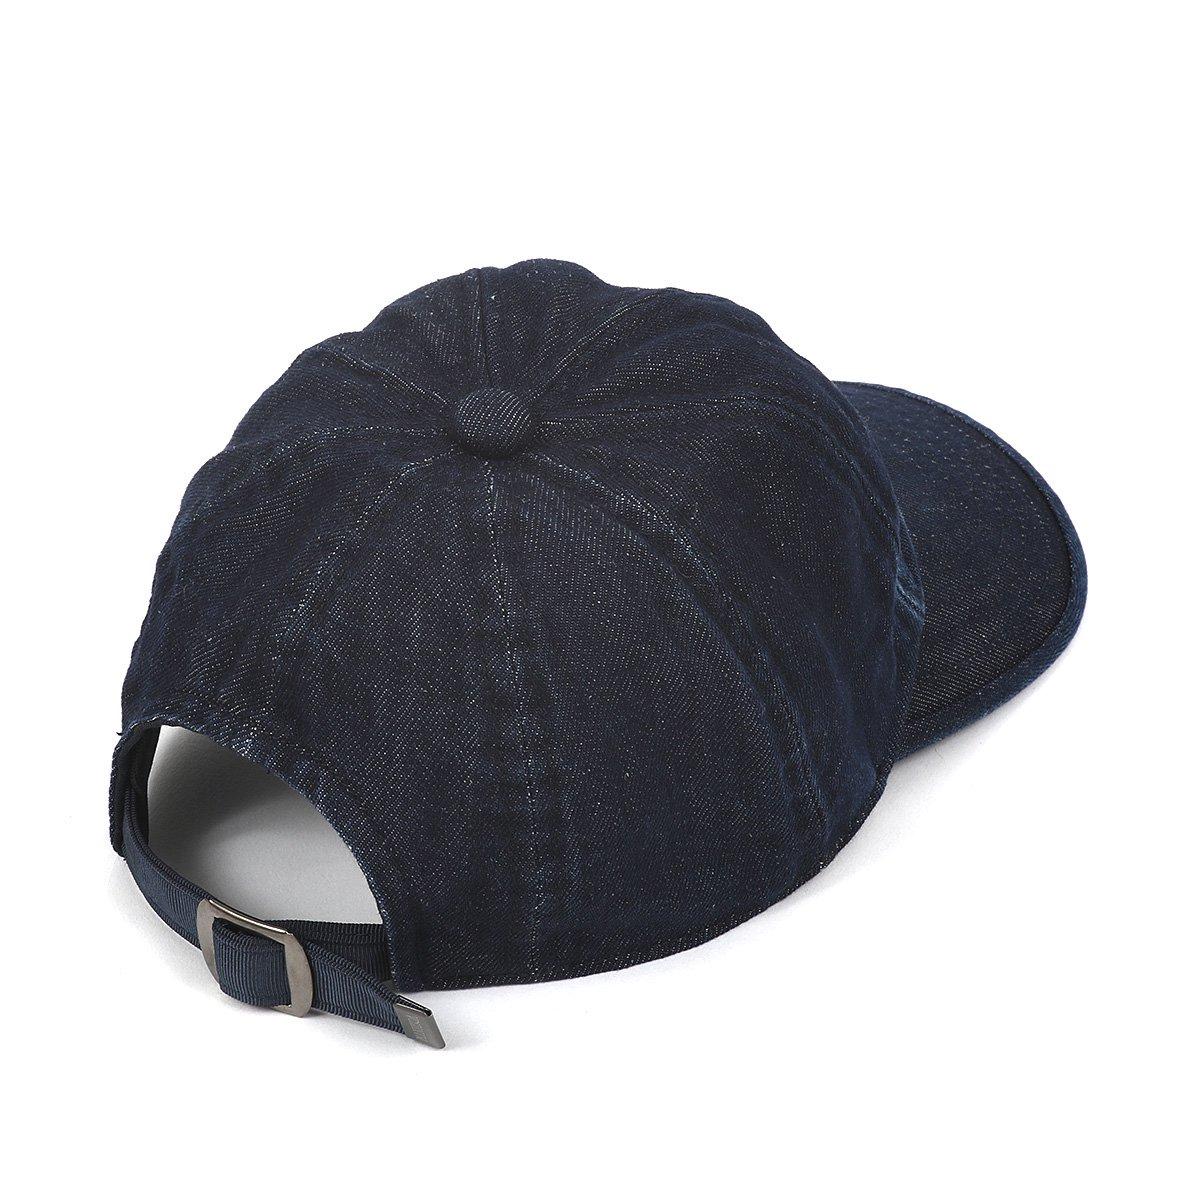 INDIGO 8PANEL CAP 詳細画像4